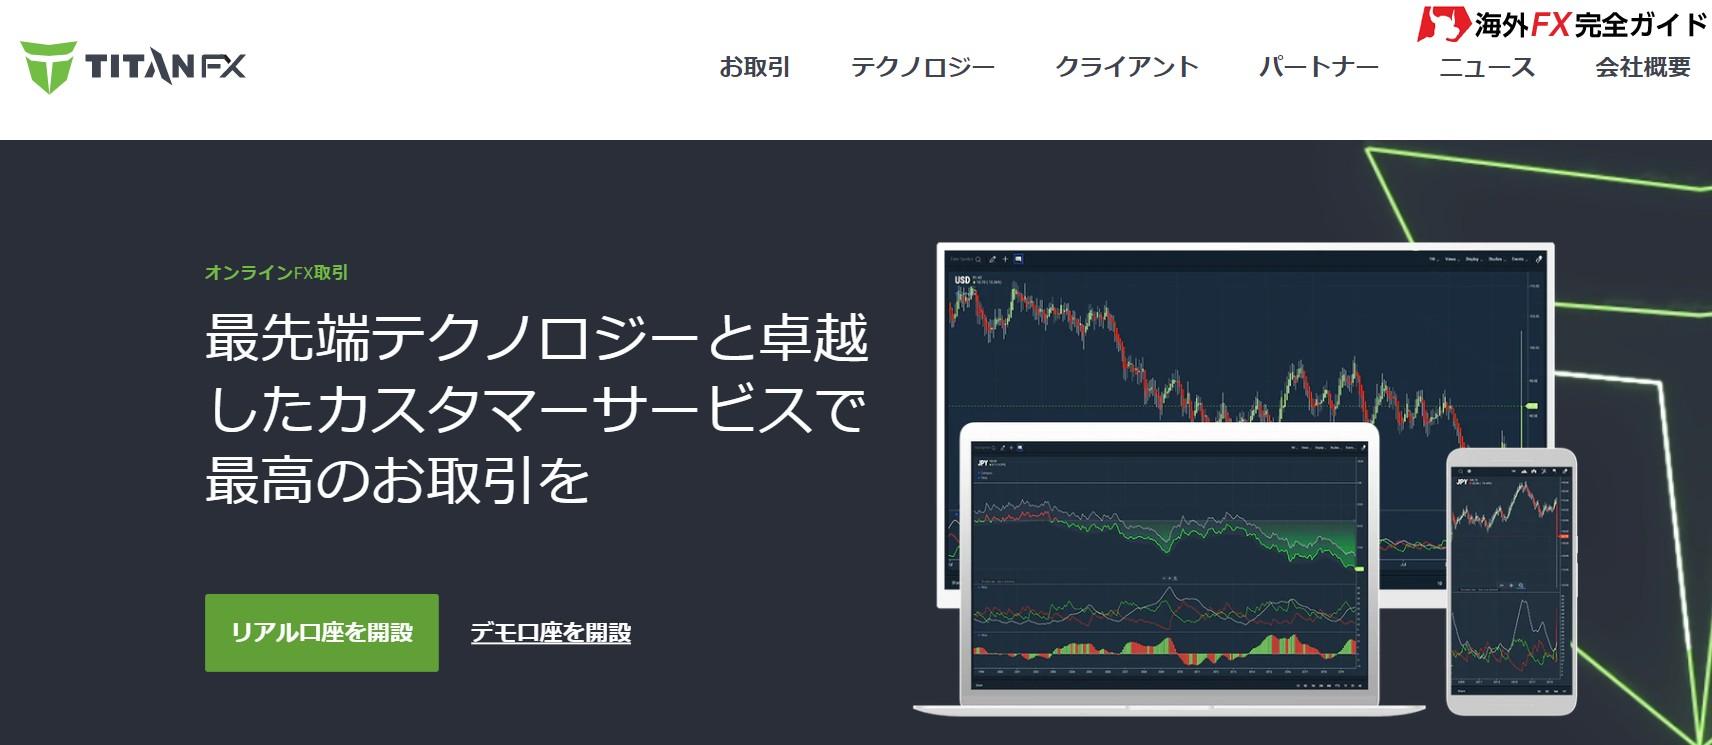 Titan FXの公式サイト